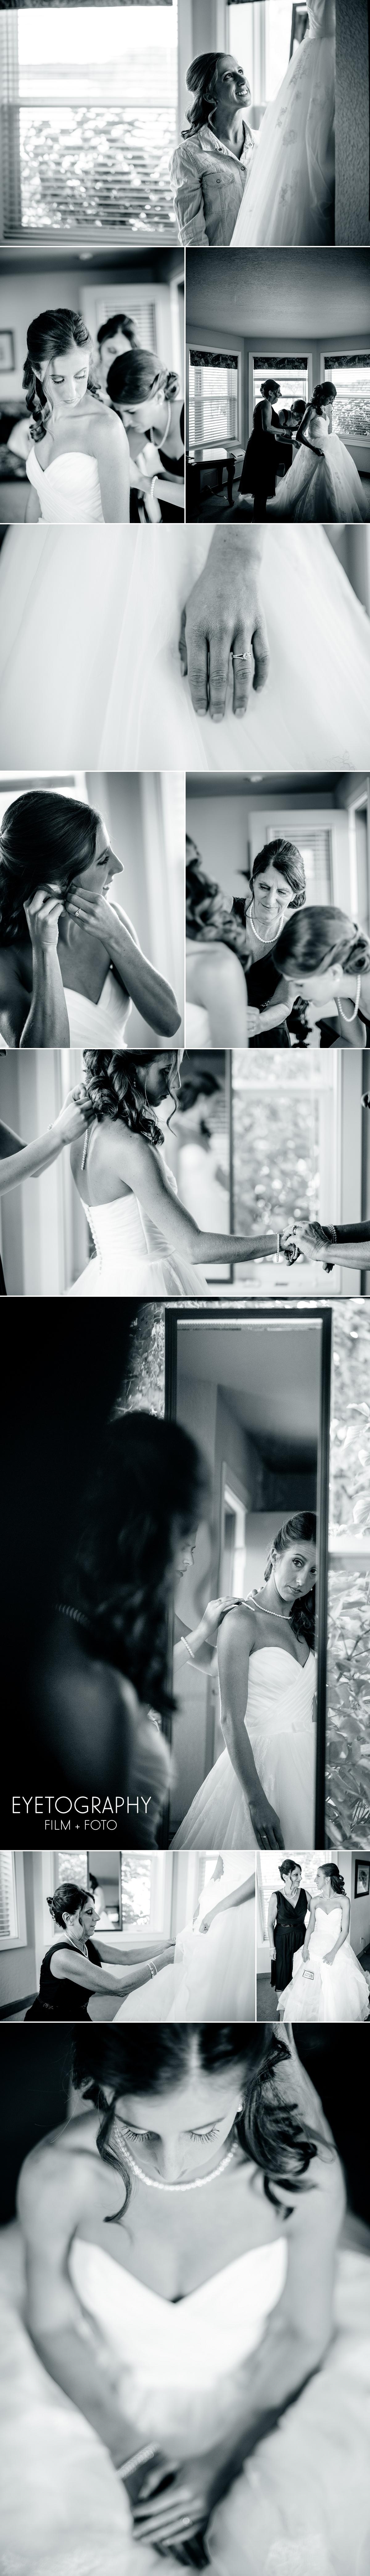 Birchwood Wisconsin Wedding Photography - Chris + Jenni - Eyetography Film + Foto 4